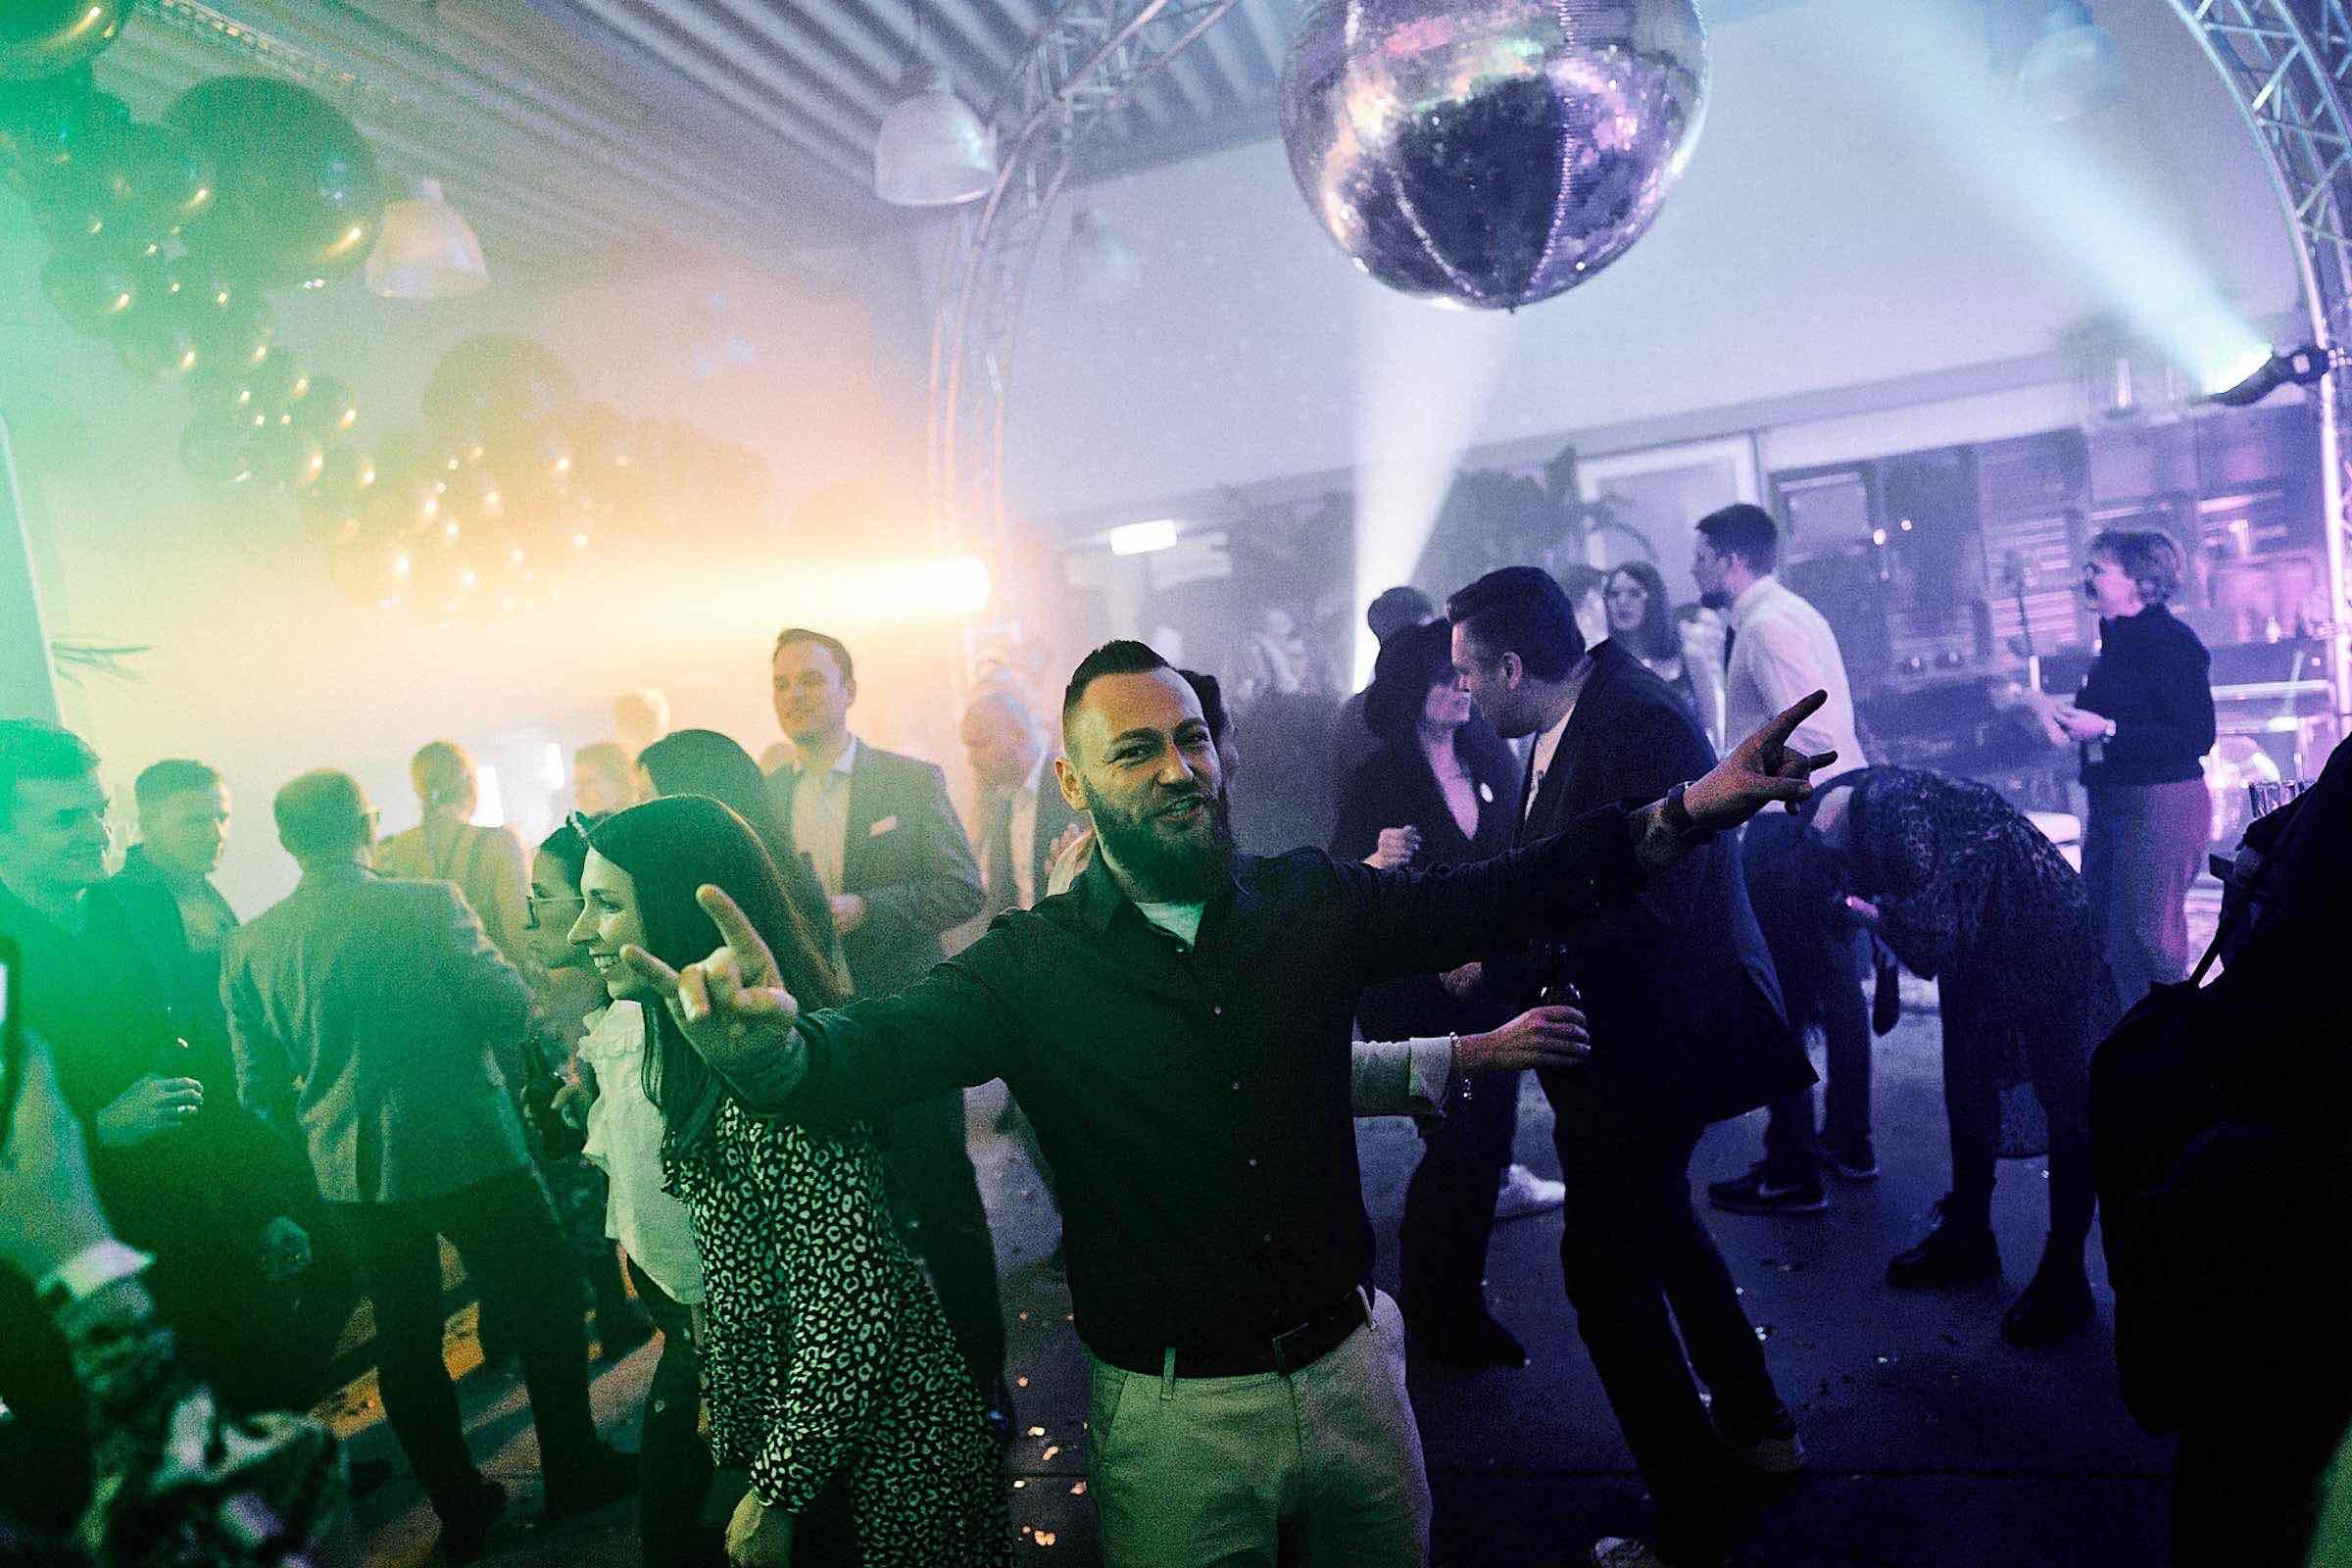 DJ | Hamburg | Buchen | DJ | Agentur | DJ | Messe | Hochzeits | DJ | Hamburg | DJ | Firmenevent | Firmenfeier | DJ | Geburtstag | DJ | Weihnachtsfeier | DJ | Sommerfest | Mieten | Hamburgfeiert